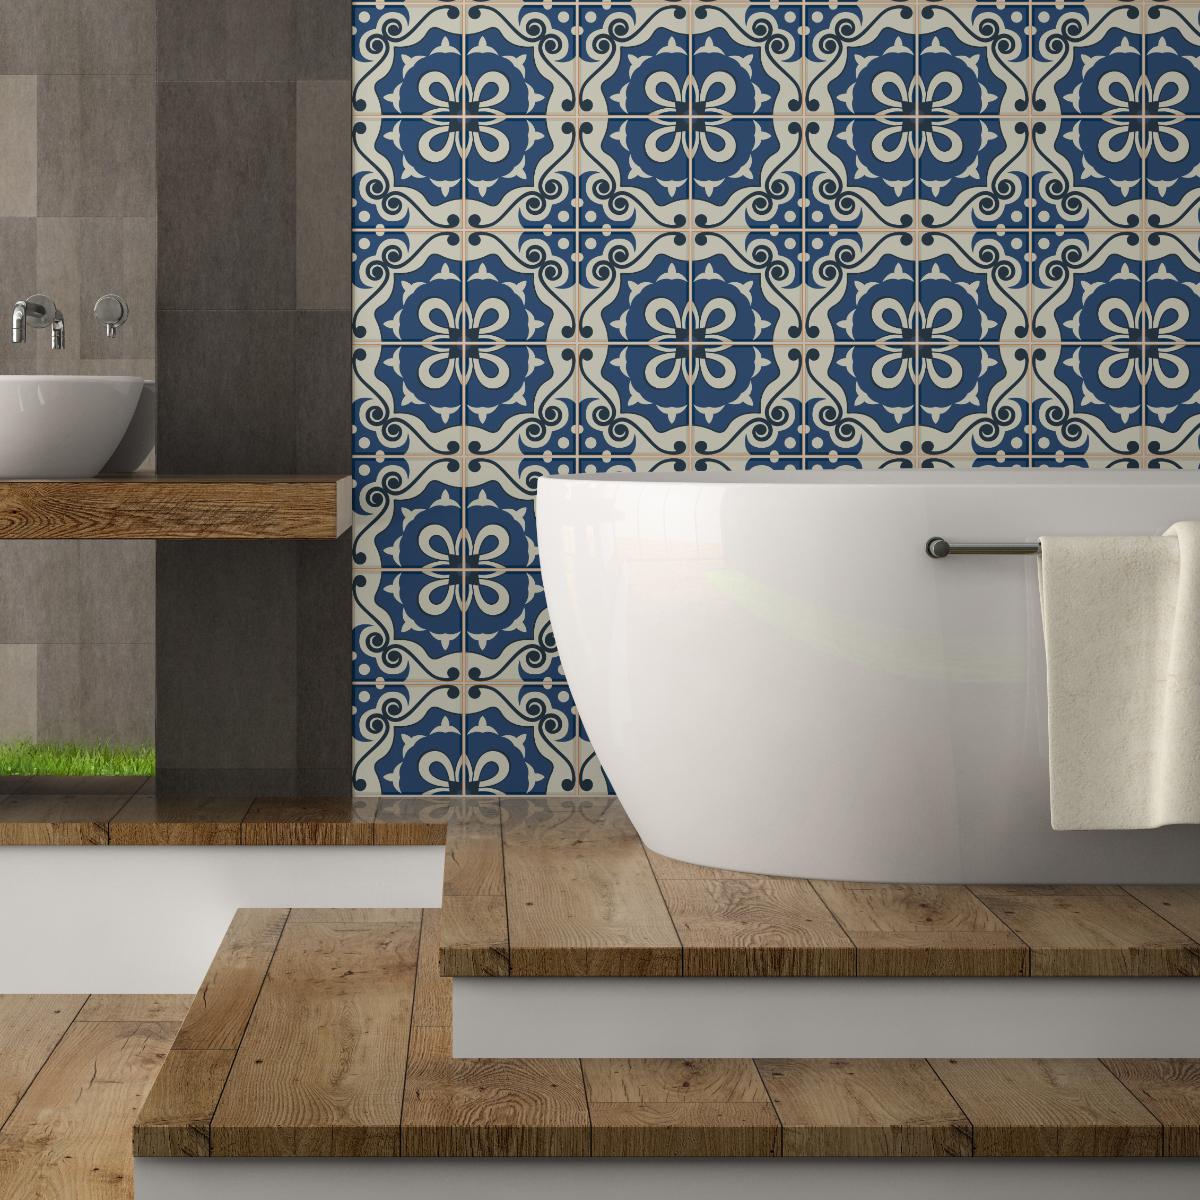 24 stickers carrelages azulejos fosca salle de bain et wc salle de bain ambiance sticker. Black Bedroom Furniture Sets. Home Design Ideas